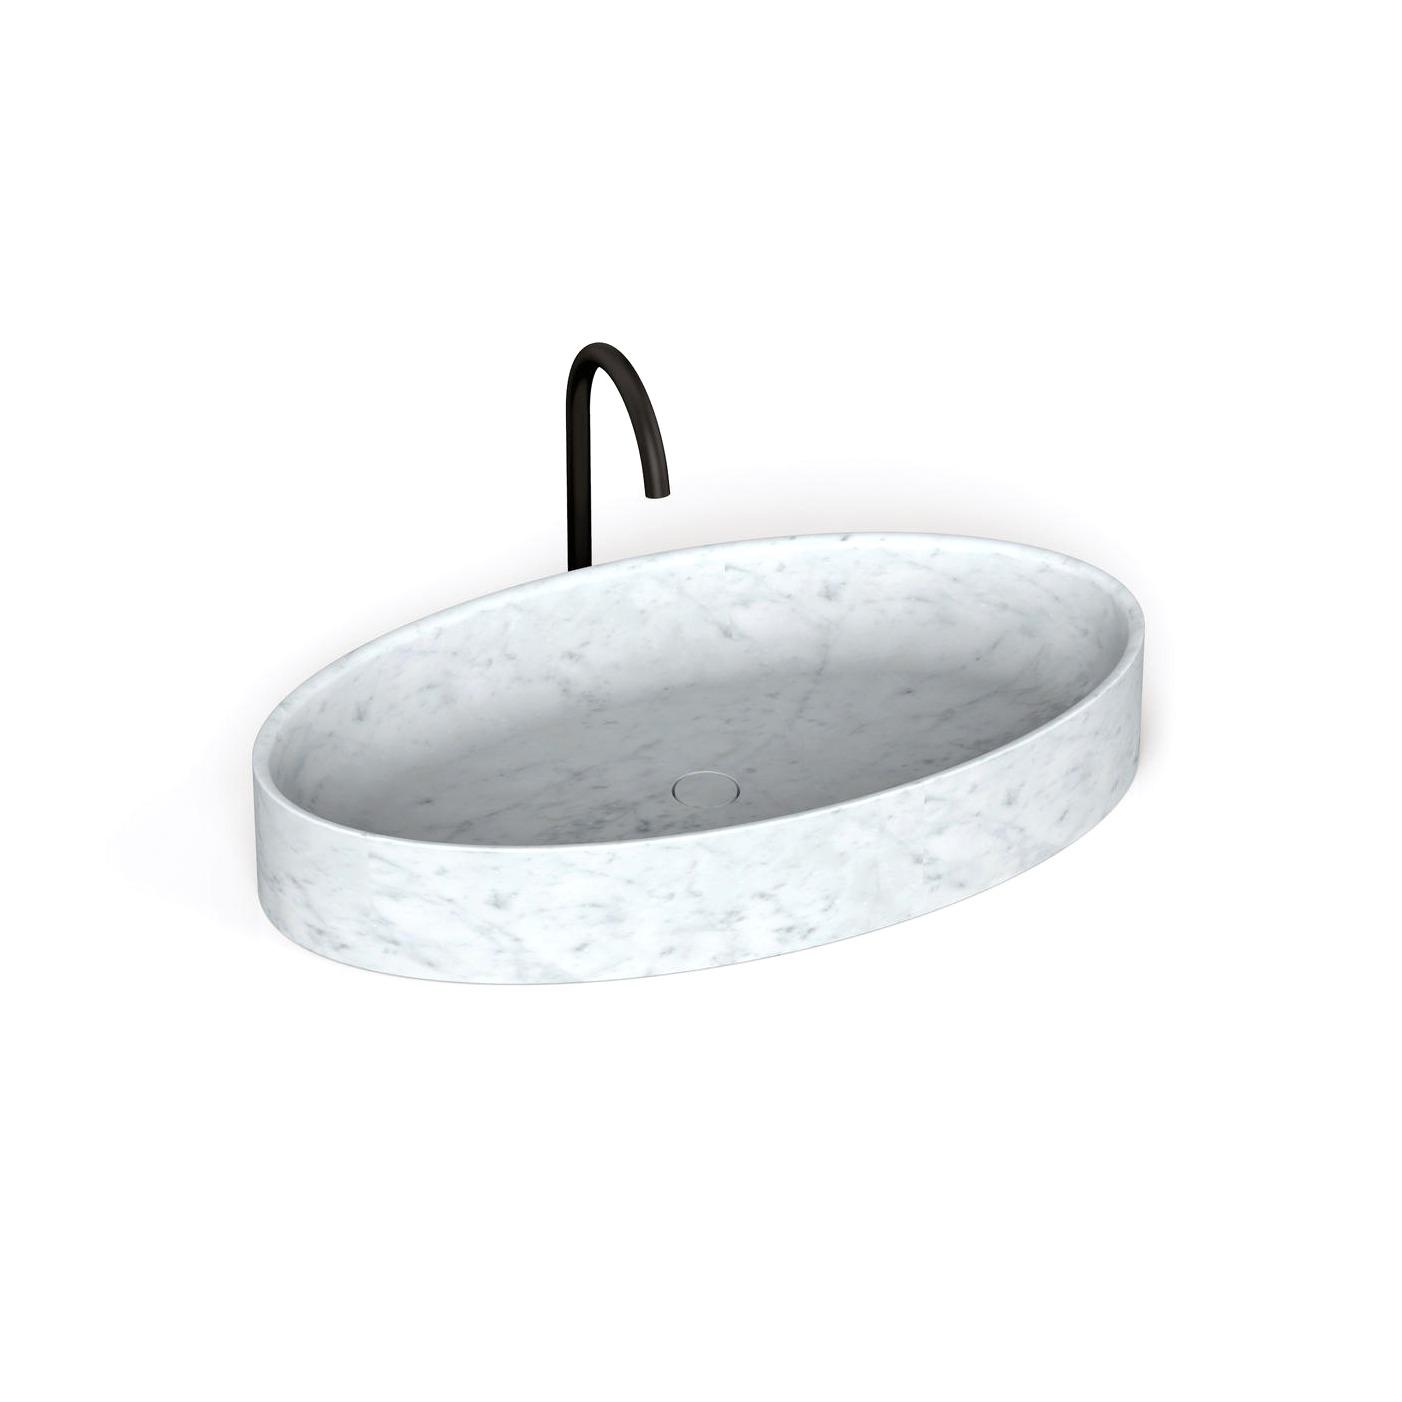 Ovale Small | Marmi Serafini